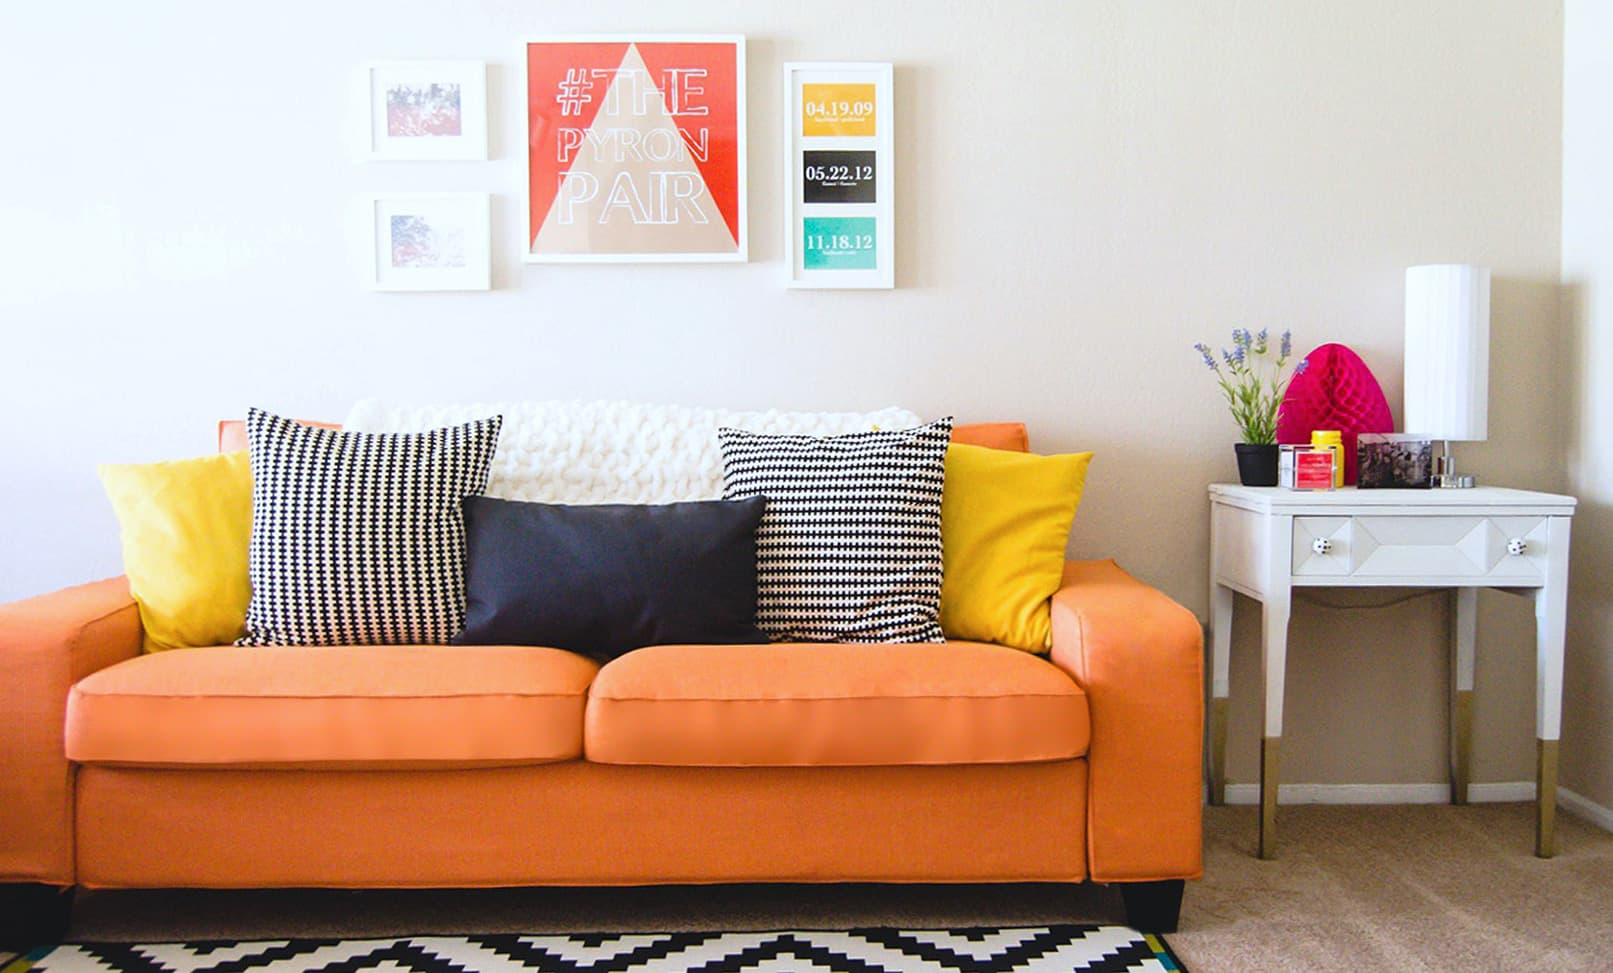 Fodere per divano kivik bellissime fodere fatte su misura comfort works - Divano kivik ikea opinioni ...